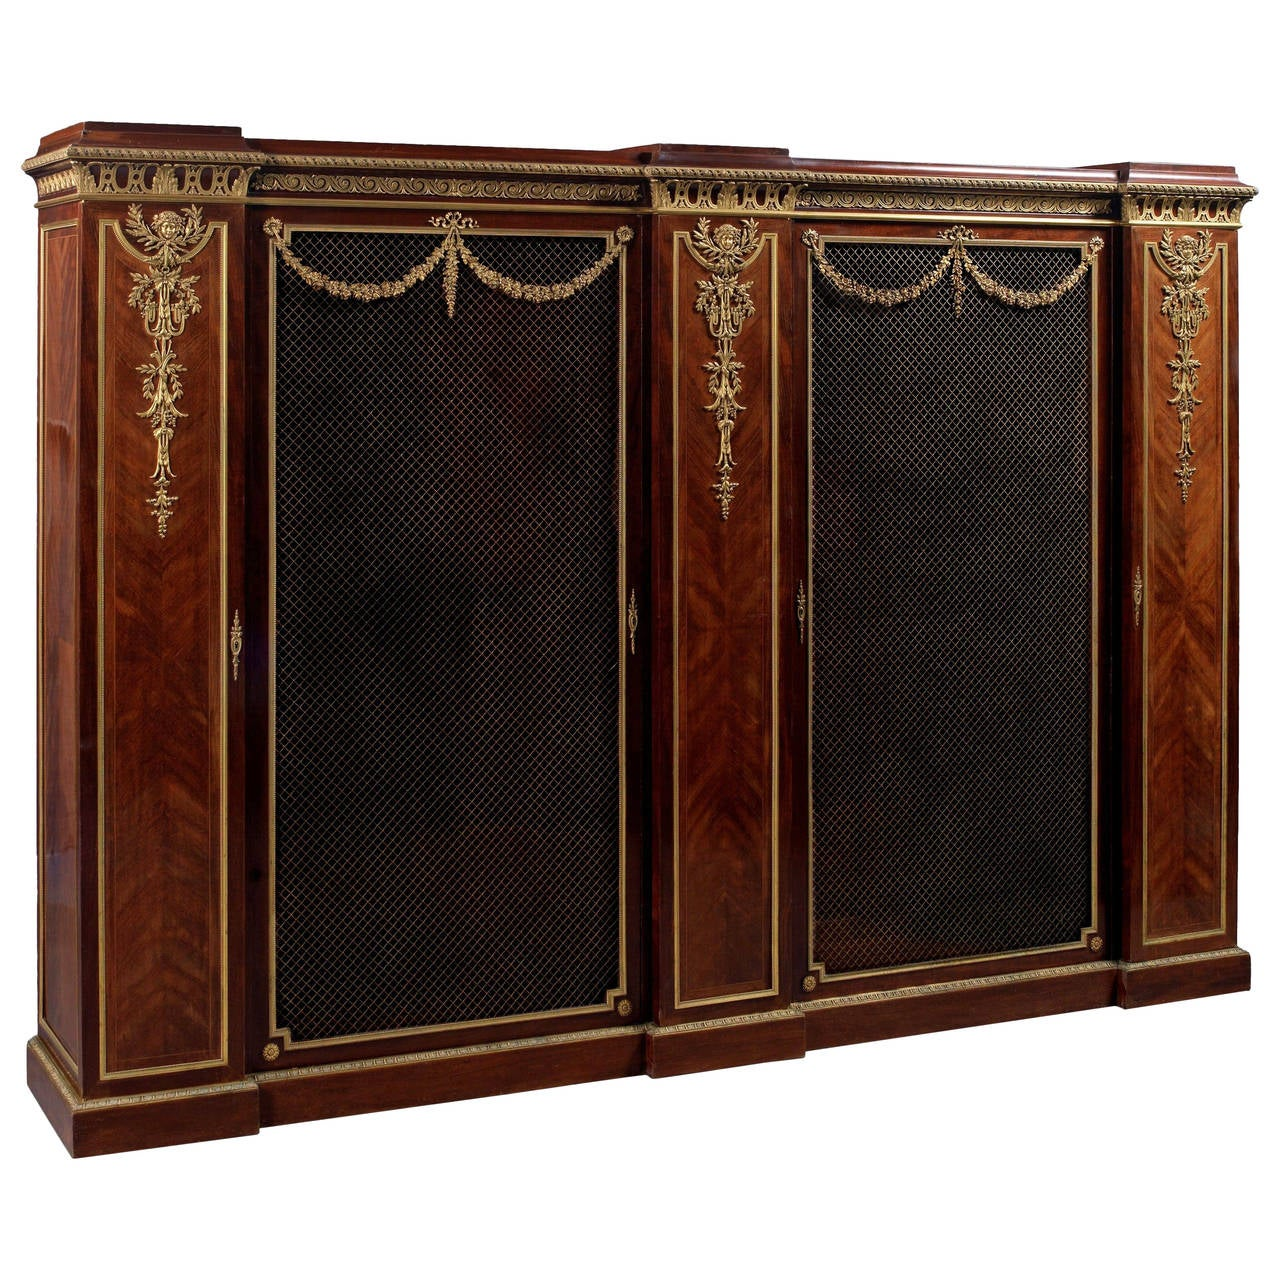 Mahogany Bookcase by François Linke